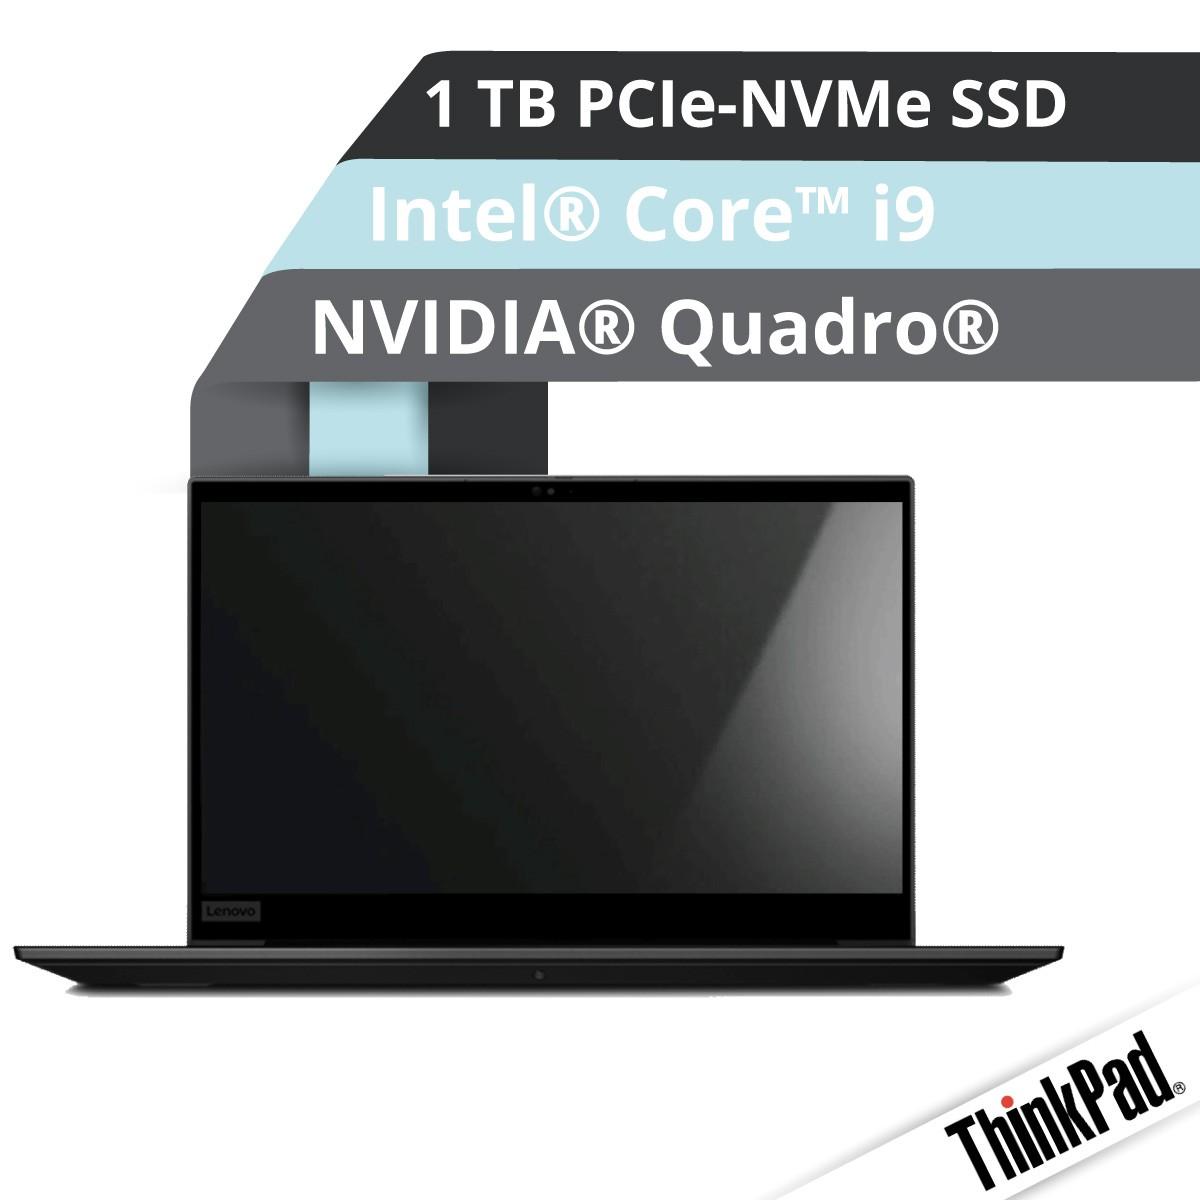 (EOL) Lenovo™ ThinkPad® P1 (Gen. 2) Workstation Modell 20QT-008B